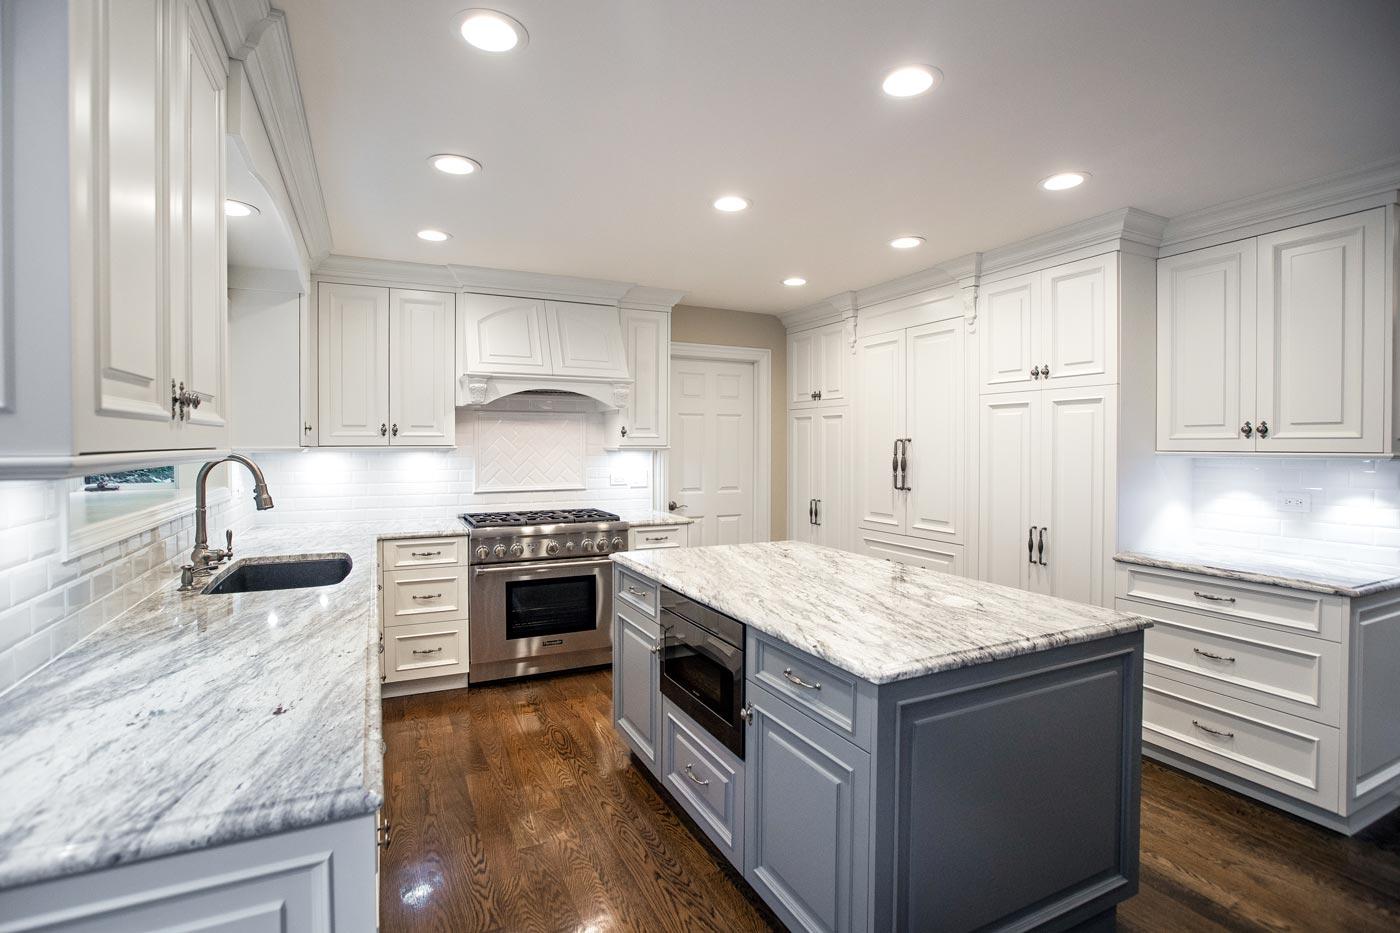 custom kitchen remodel - linly designs